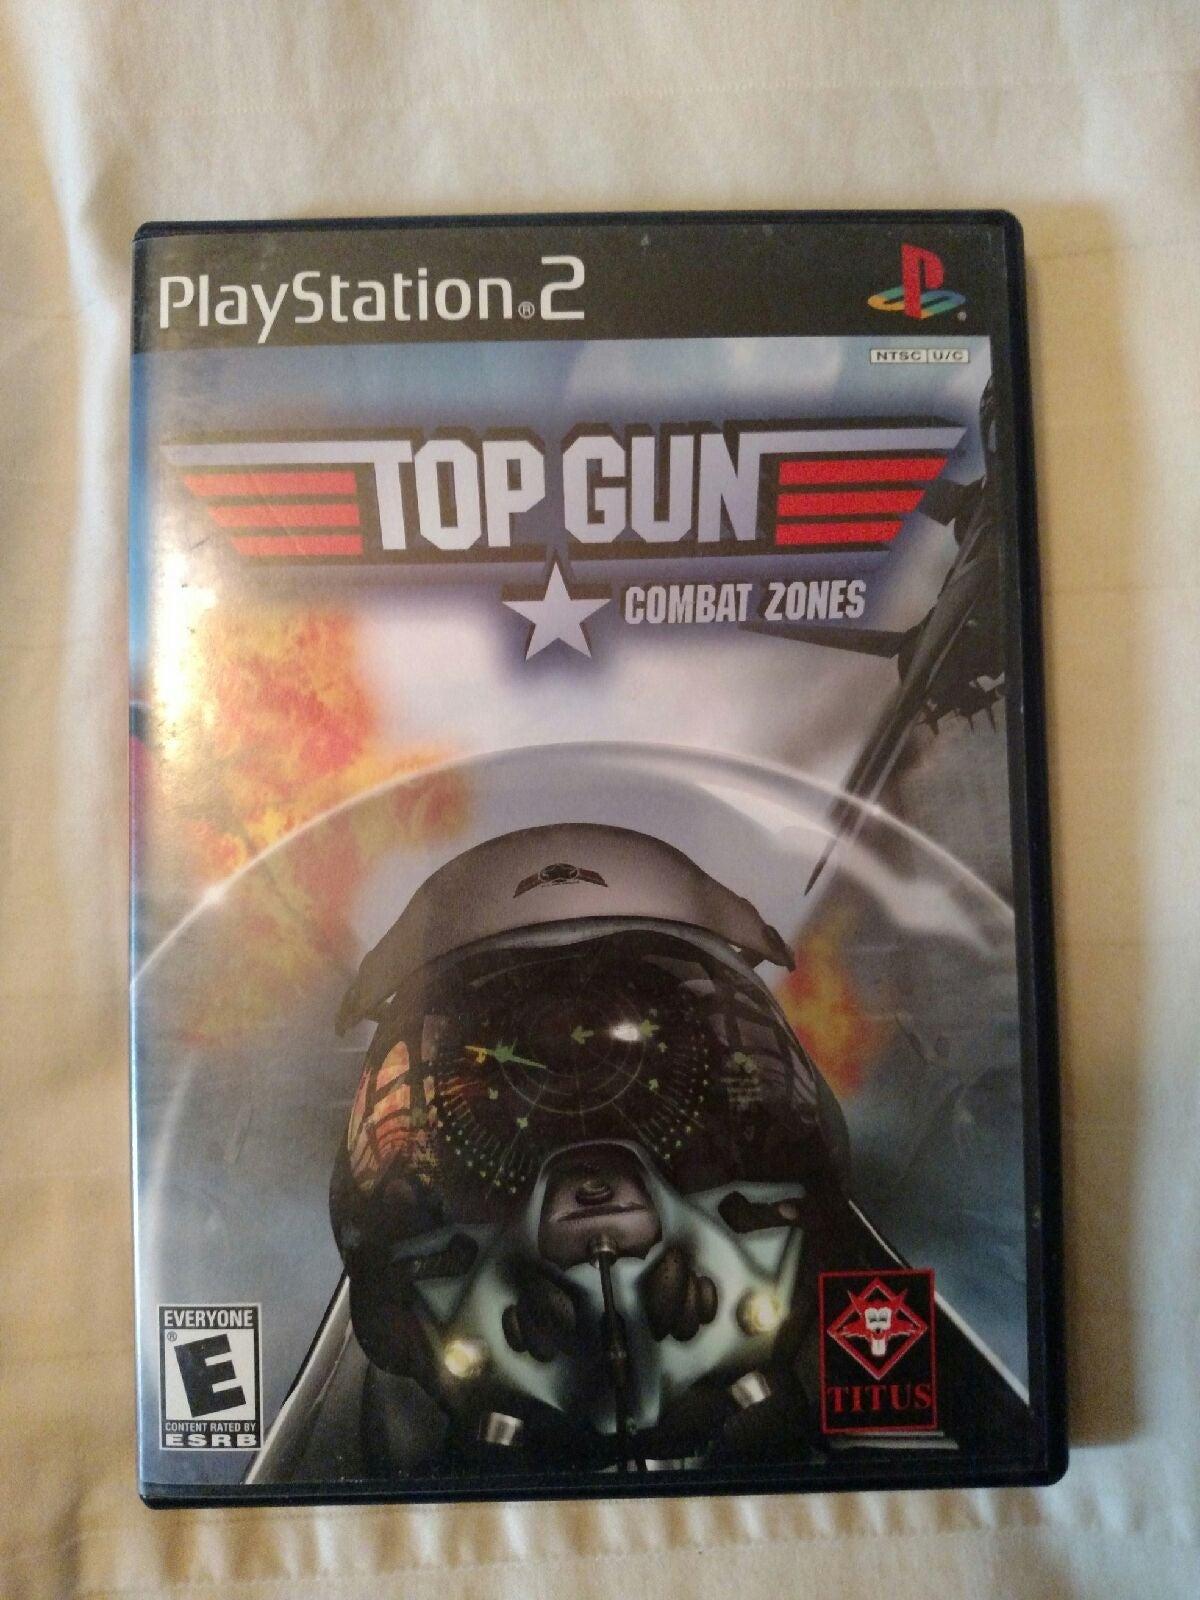 PS2 game disc Top Gun combat zone